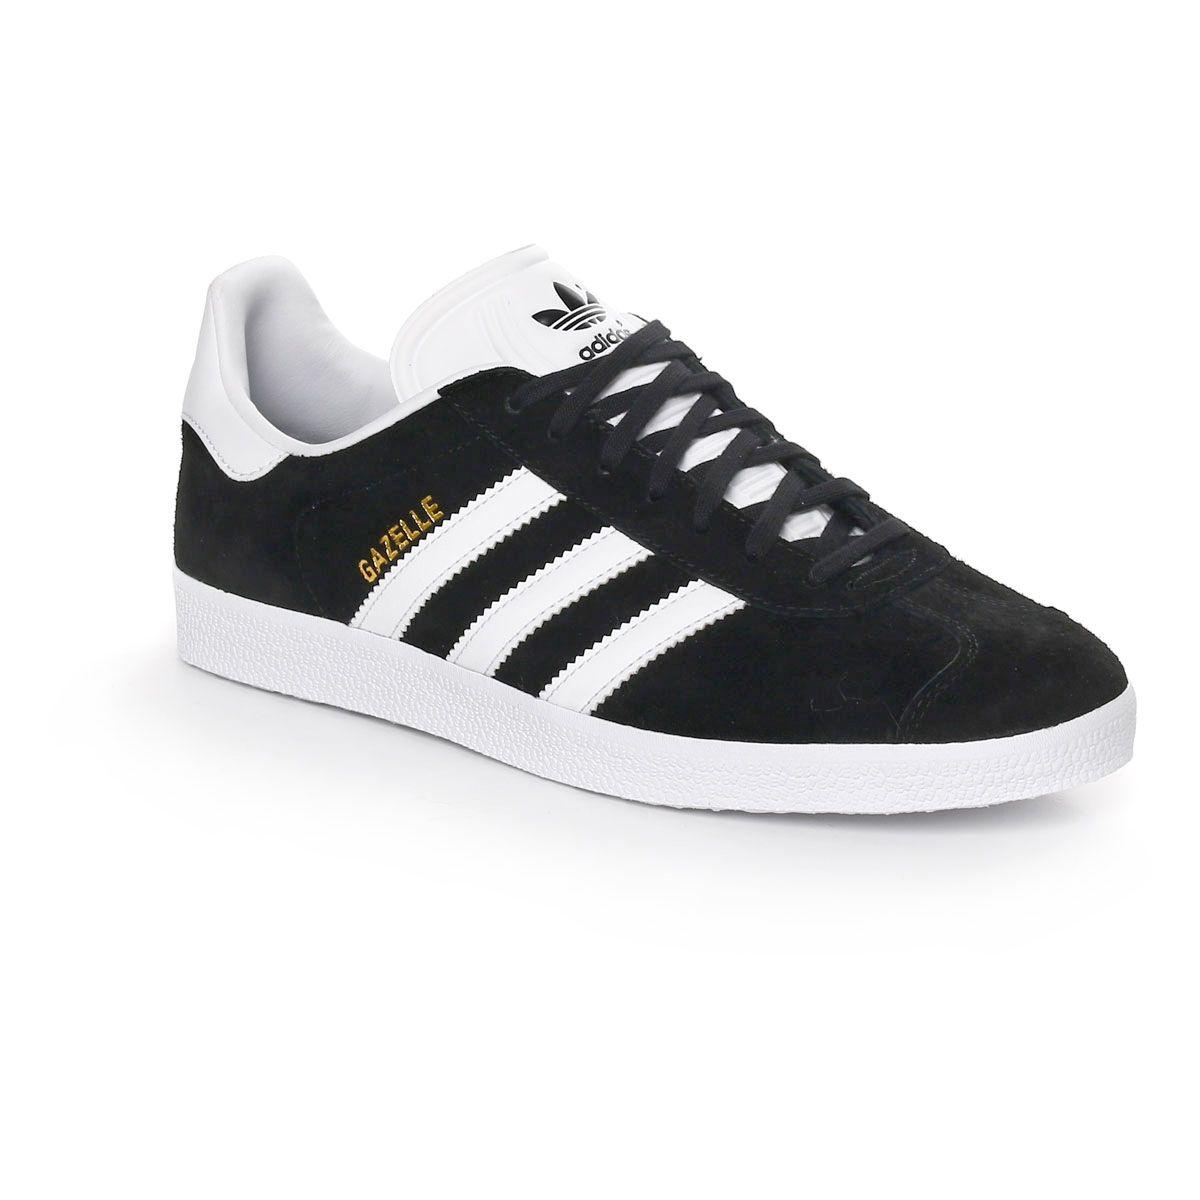 Adidas Originals Gazelle Nero Bianco